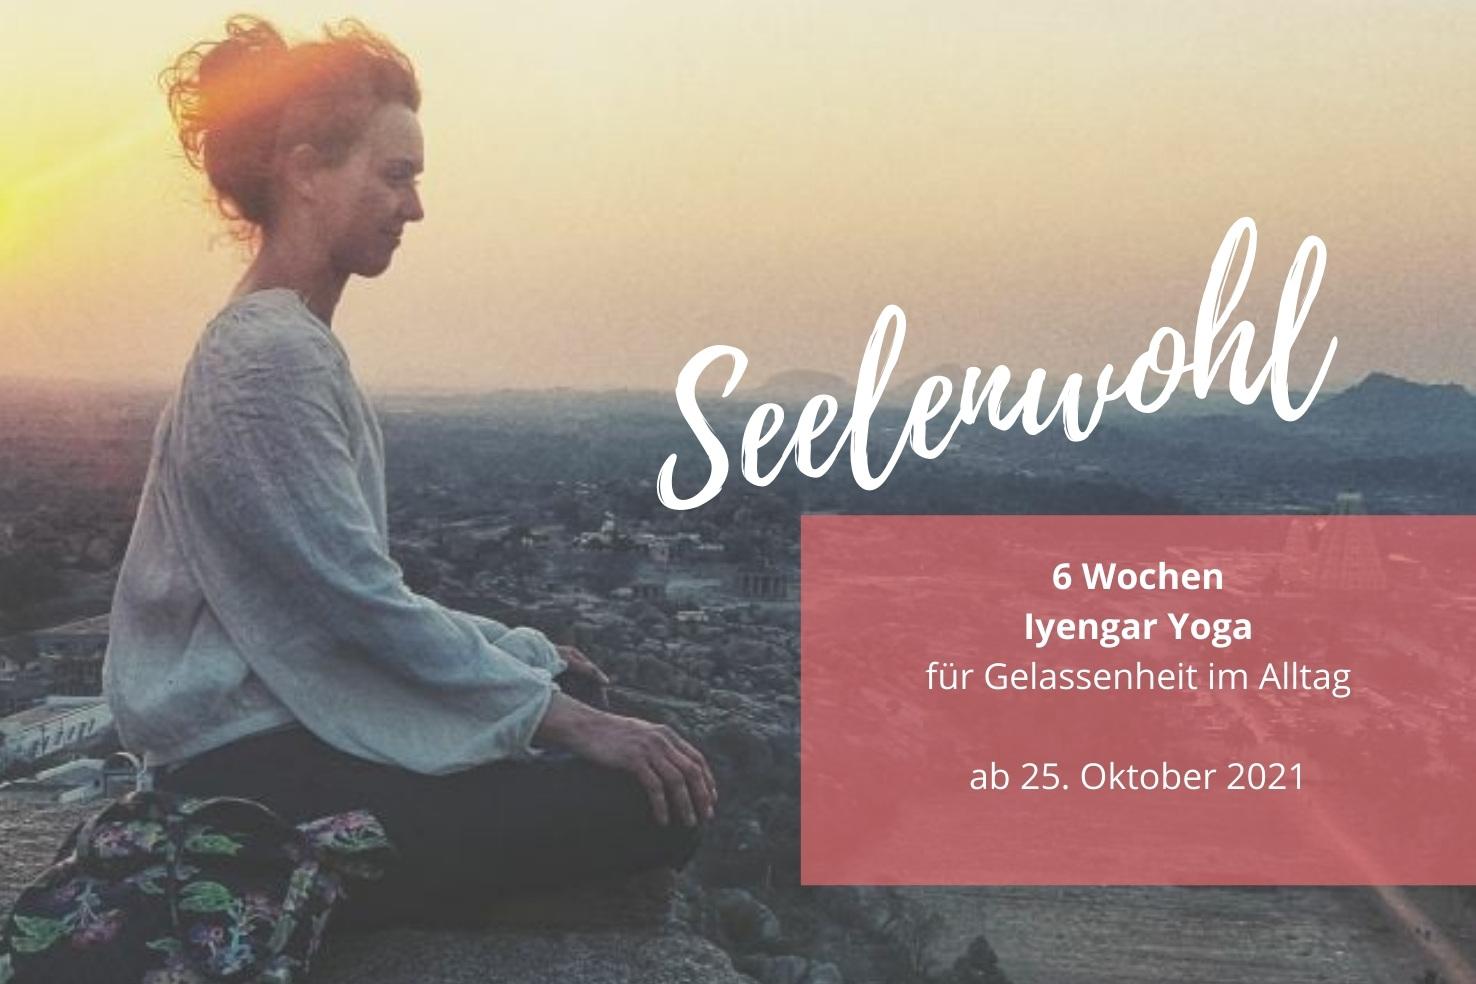 6 Wochen Seelenwohl –Onlinekurs Iyengar Yoga ab 23.10.21